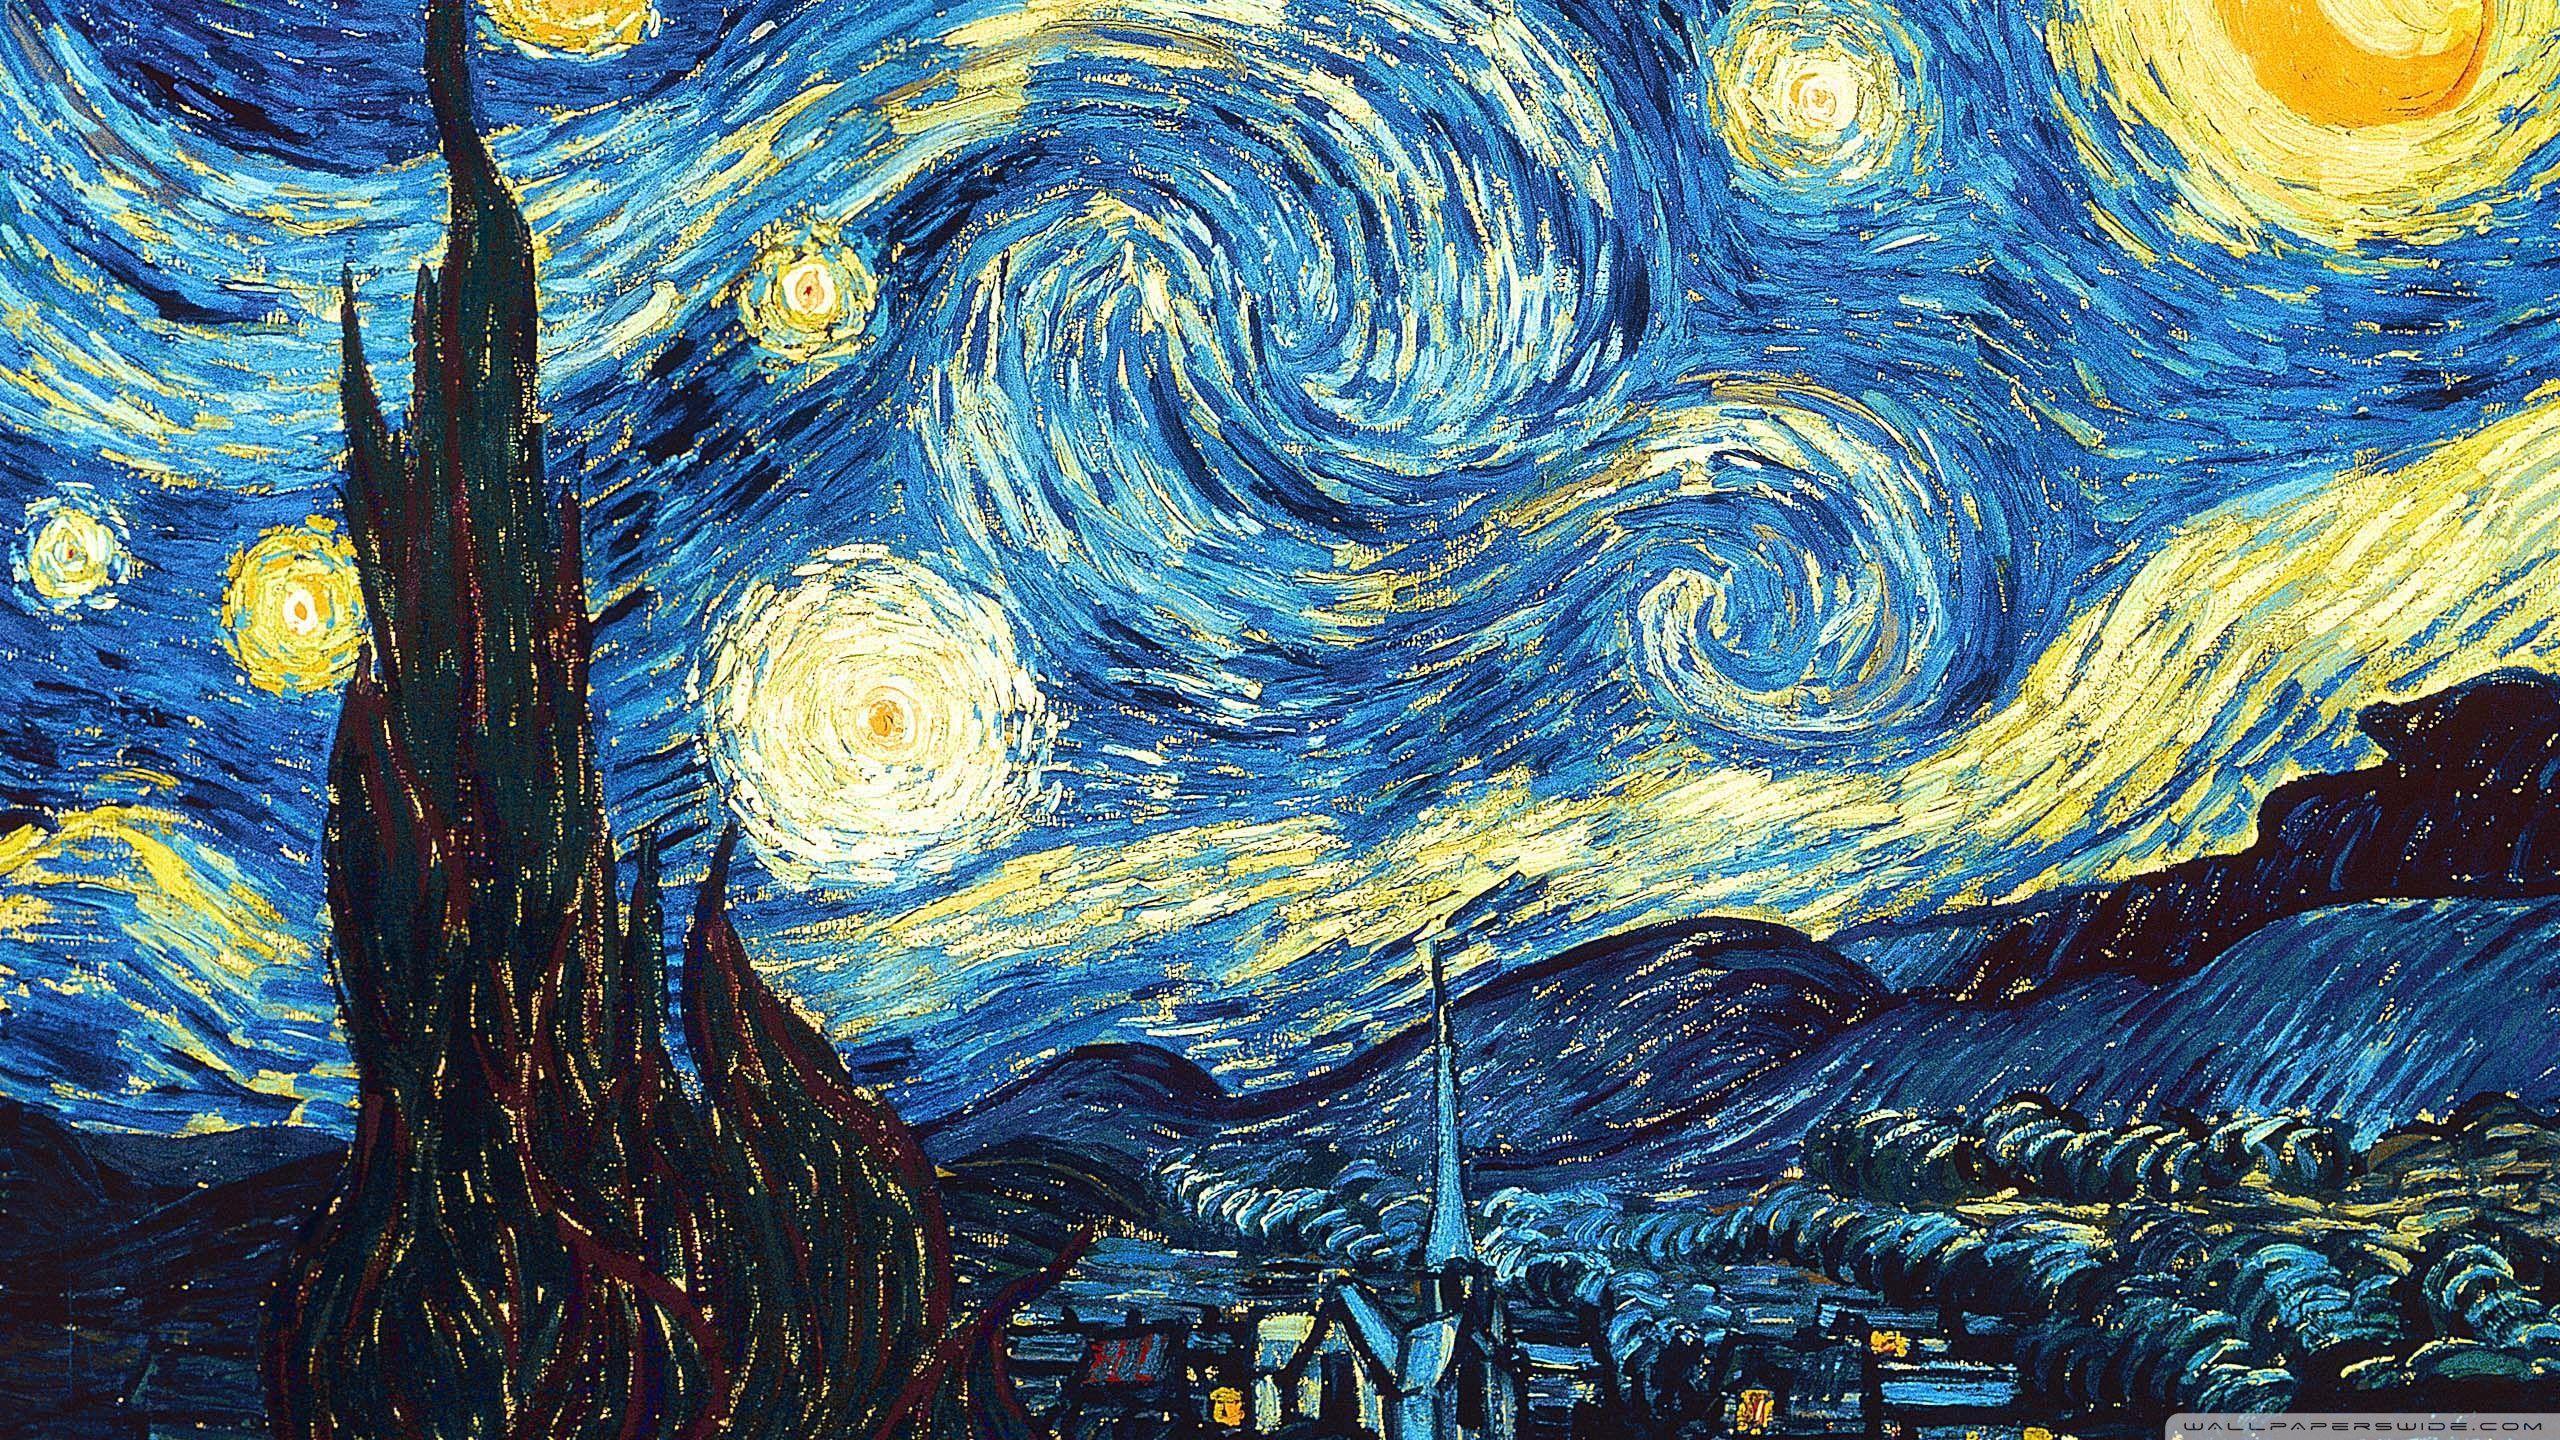 Van Gogh Starry Night Grande Mug in Gift Box | Stash Tea |Van Gogh Wallpaper Starry Night